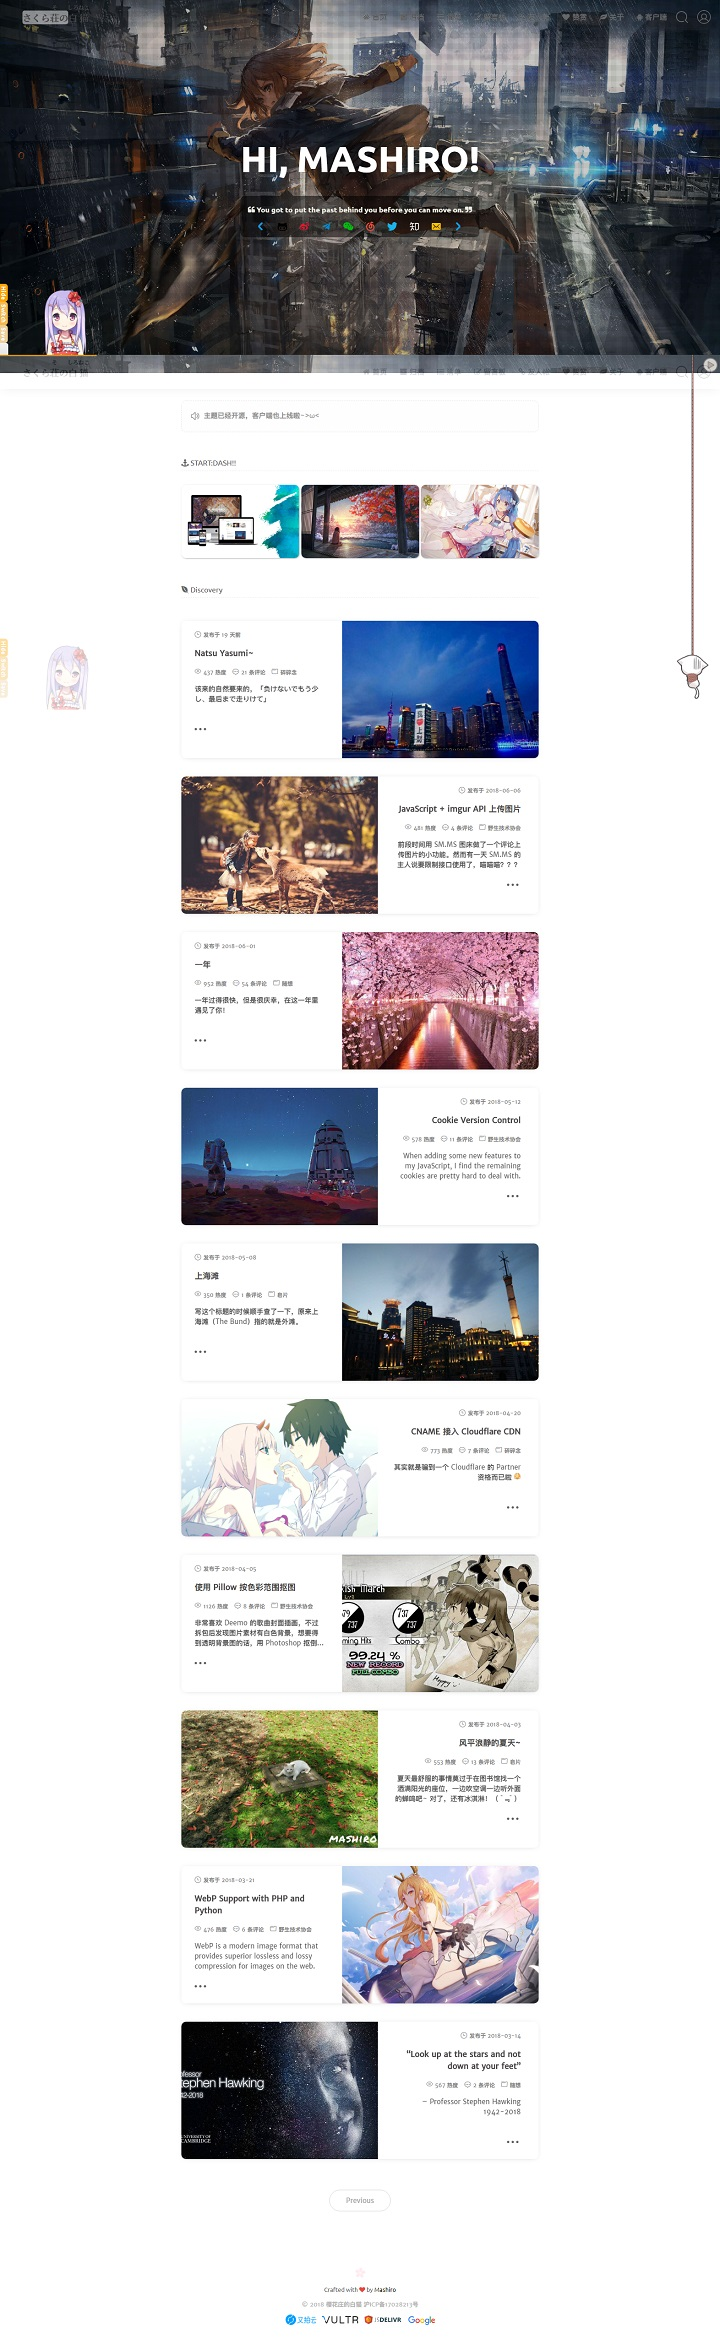 WordPress个性博客主题 Sakura 官方开源版 免费下载 WordPress博客主题 WordPress开源免费主题 第2张